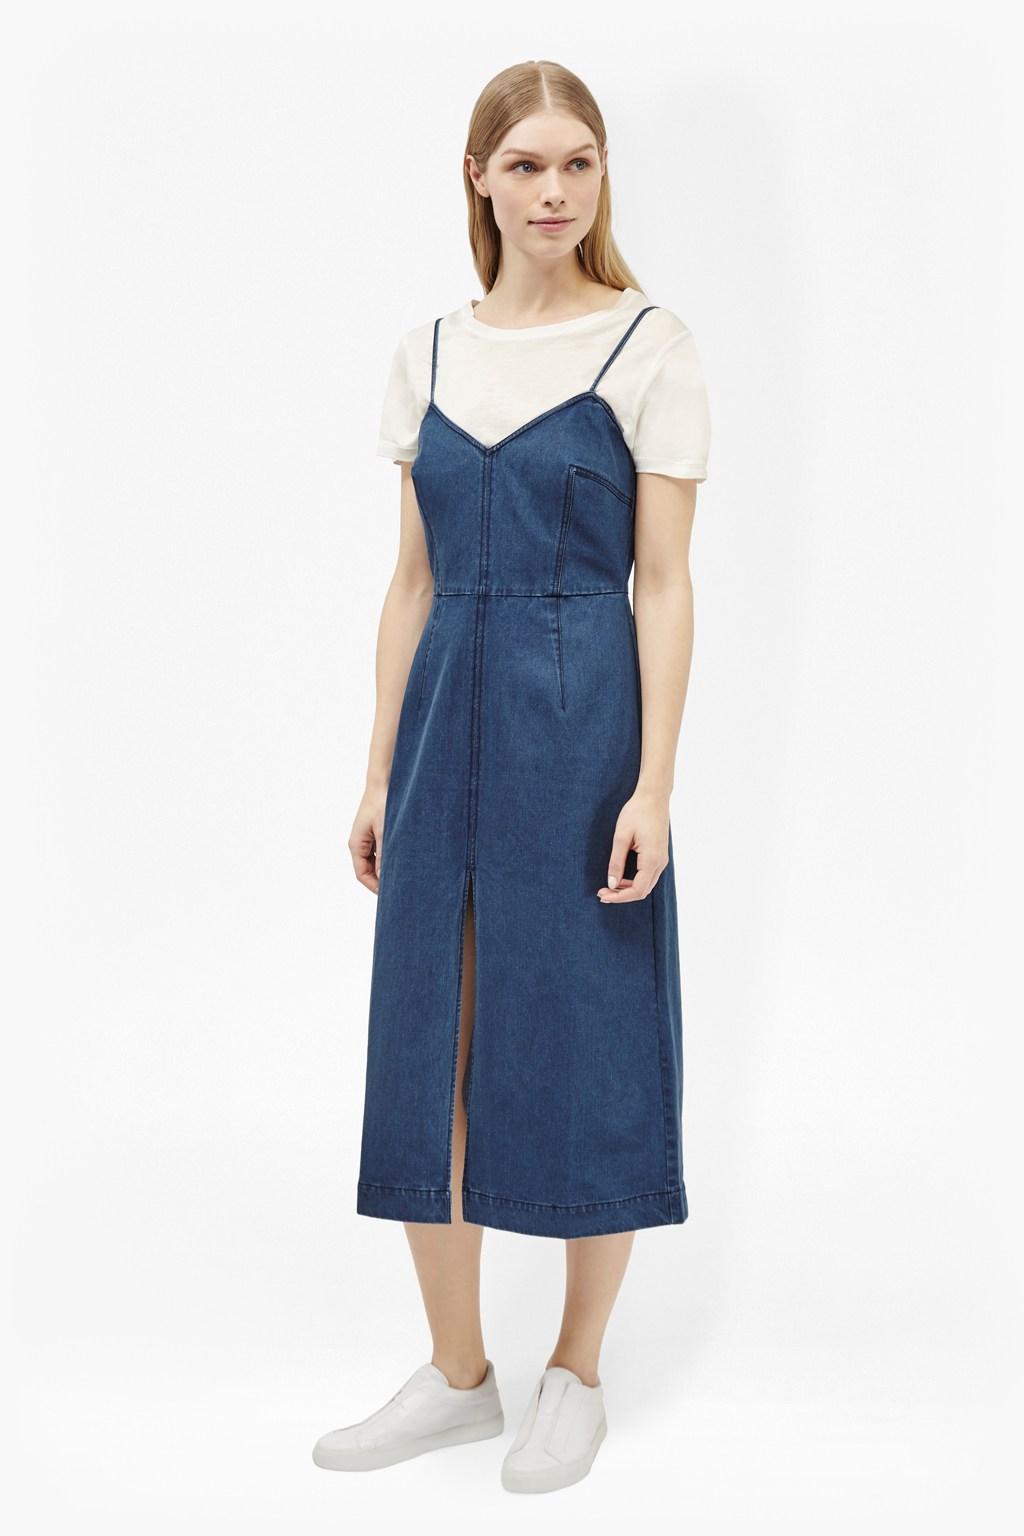 blue-med-dress-slip-white-tee-layer-white-shoe-sneakers-denim-spring-summer-blonde-weekend.jpg